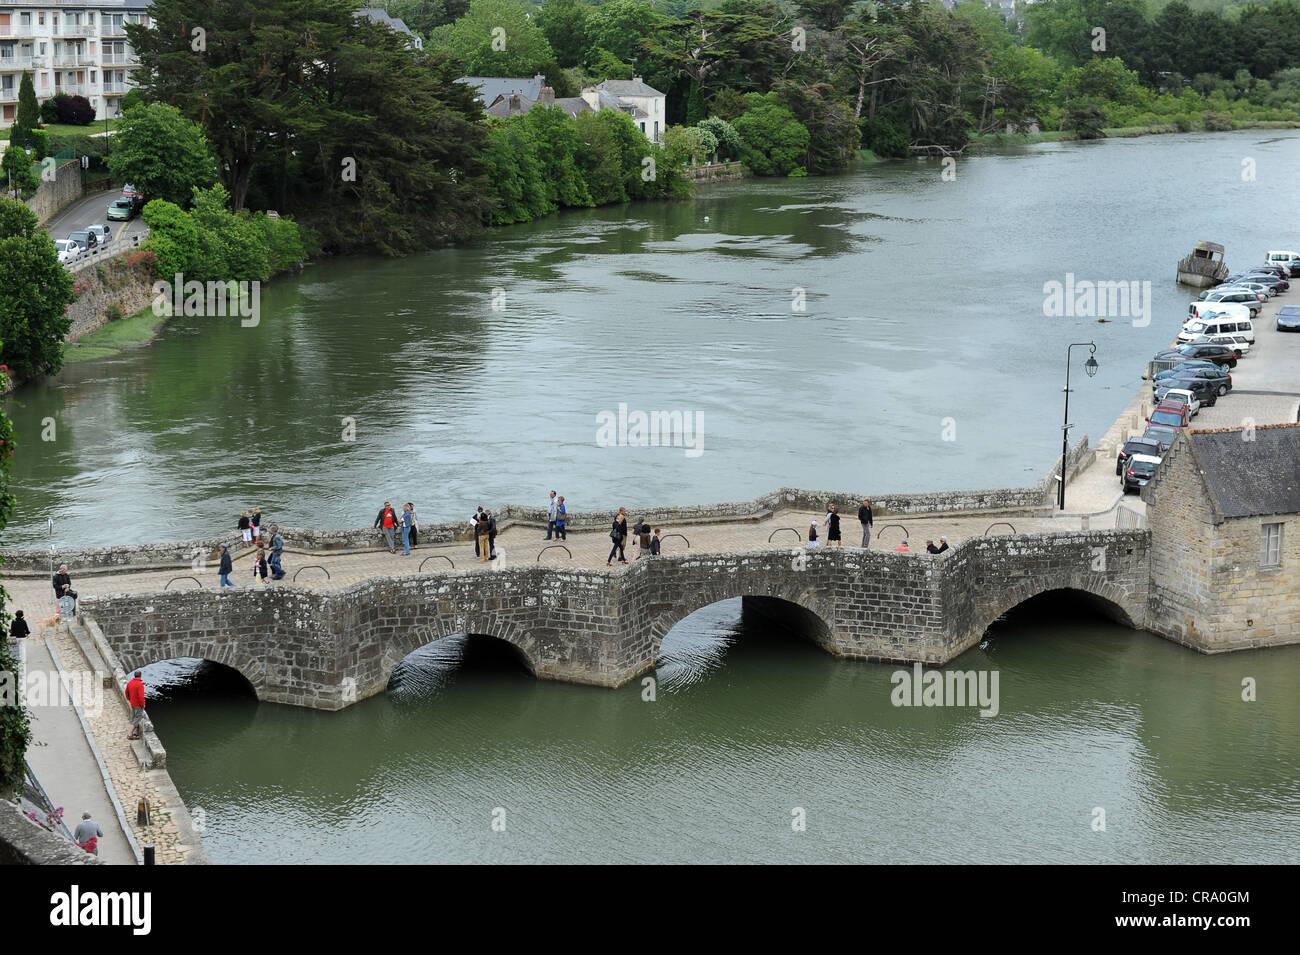 The Pont-Neuf bridge in Auray Brittany France Saint Goustan Port d'Auray - Stock Image